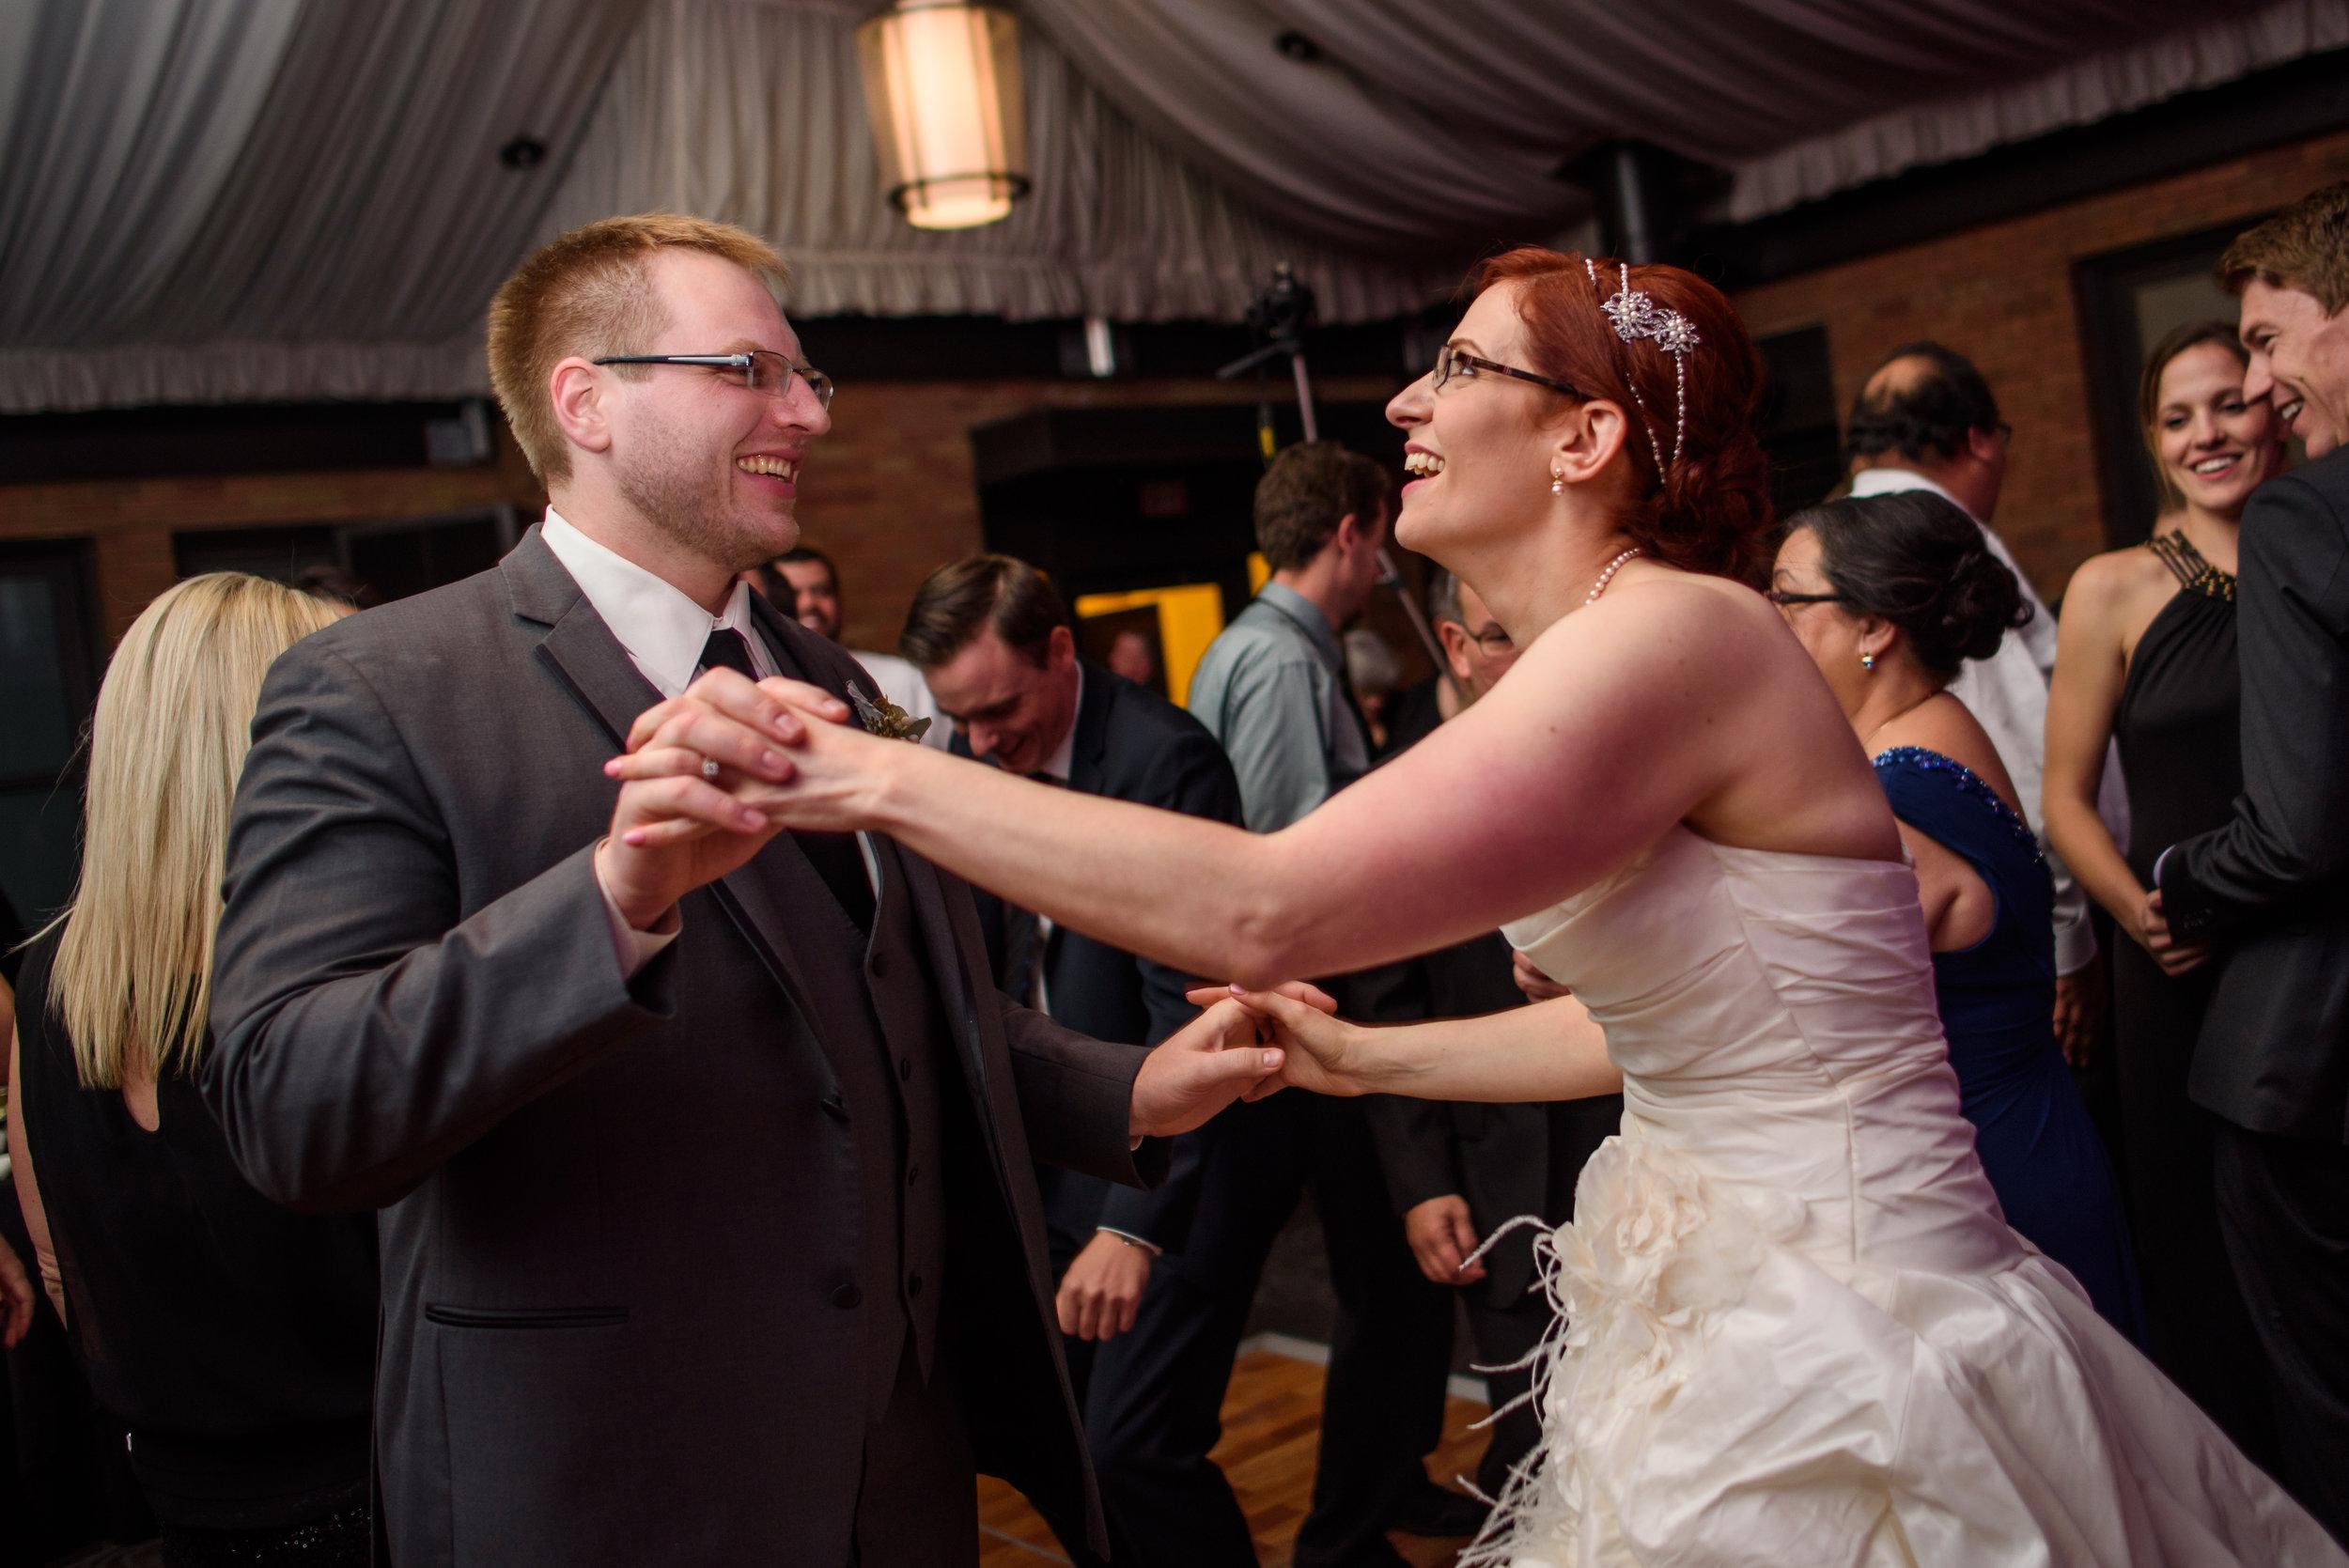 judith-john-011-citizen-hotel-sacramento-wedding-photographer-katherine-nicole-photography.JPG